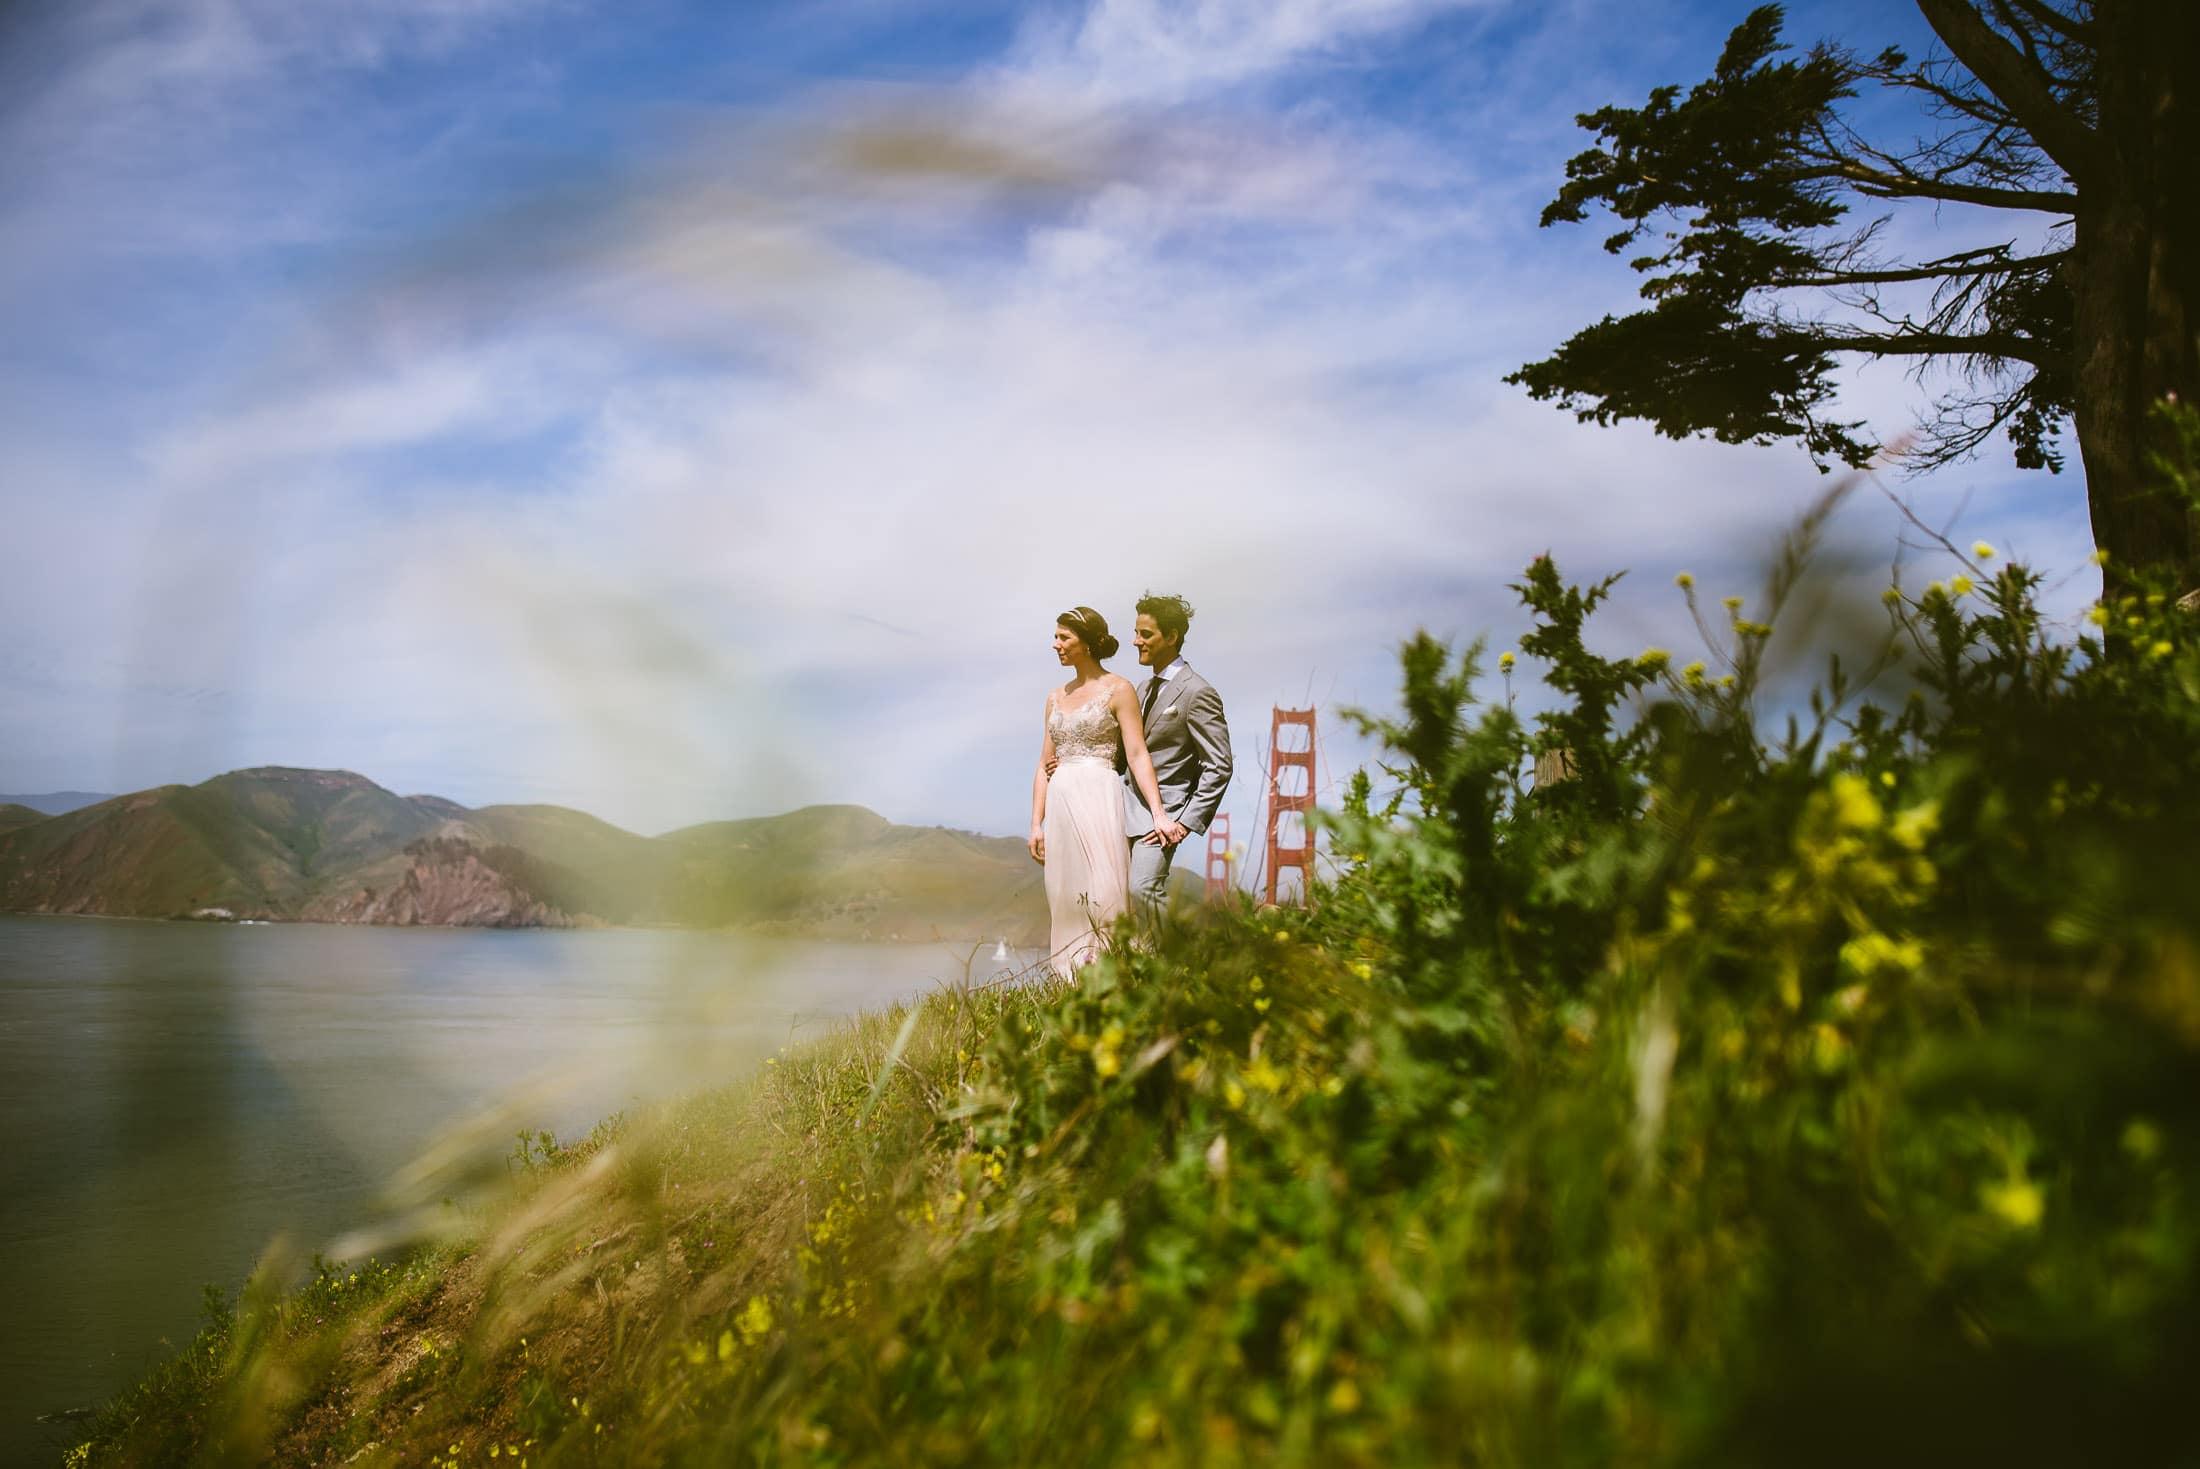 Golden Gate Bridge Wedding Pictures